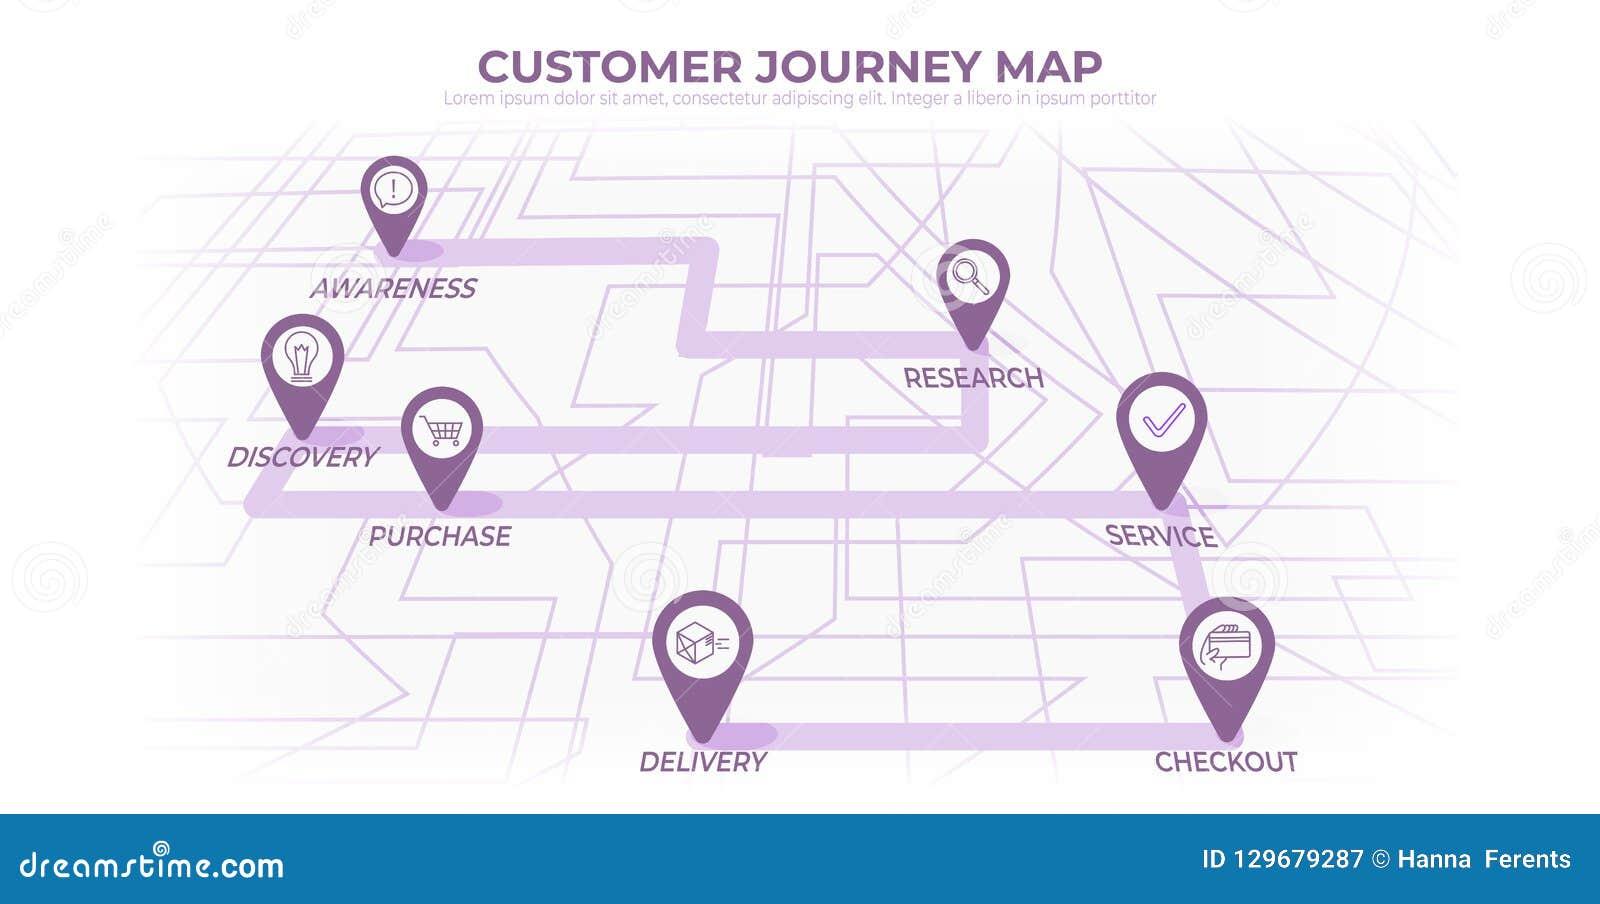 buying organization chart, buying process stages, buying process model, buying process service, strategy map, buying process chart, customer experience map, customer buying map, customer segmentation map, on buying process map